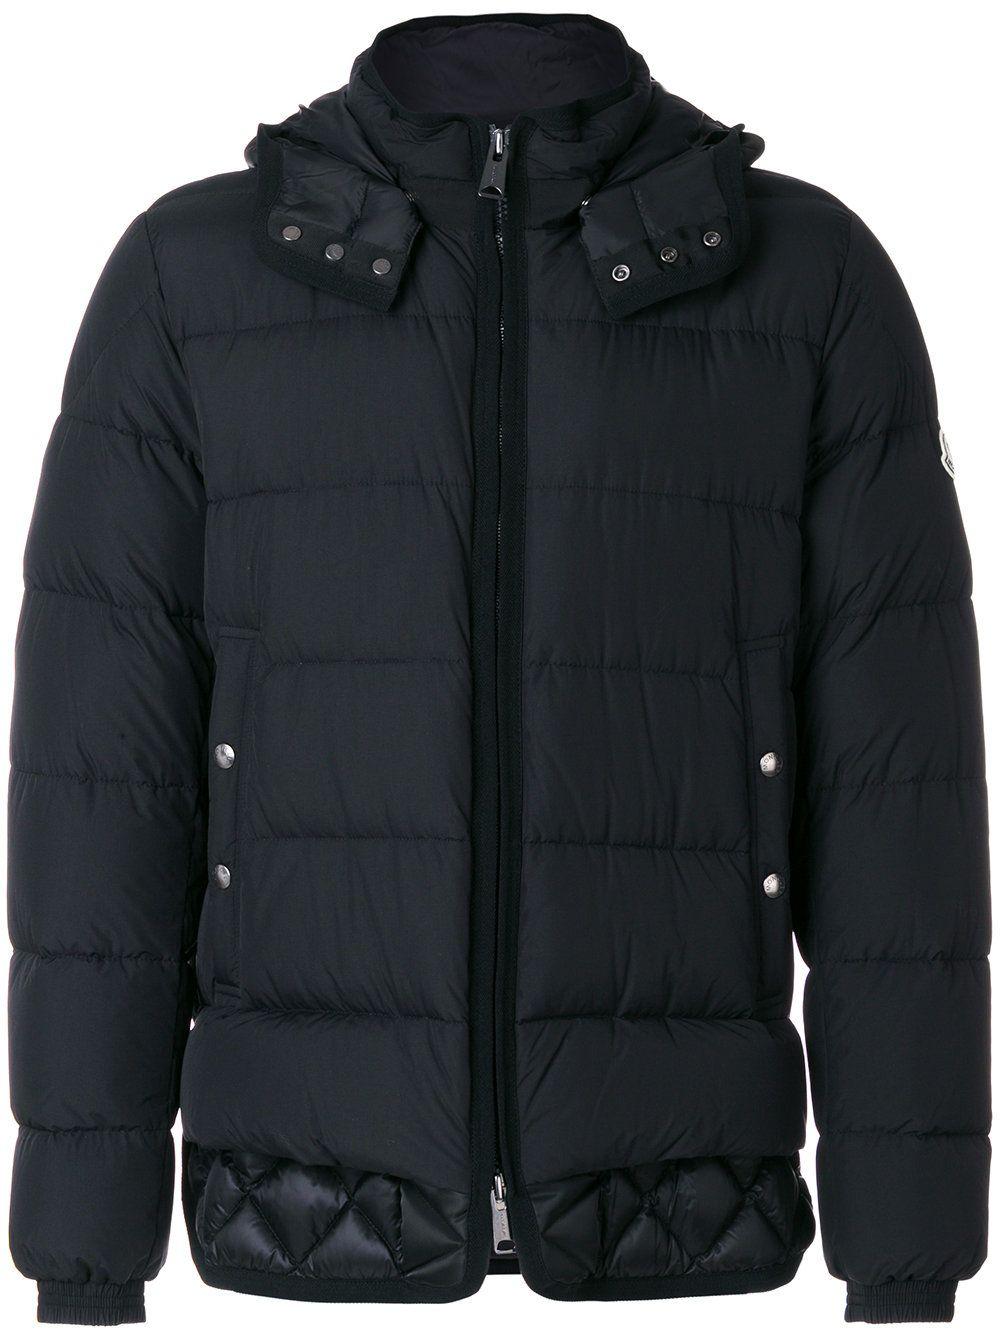 Moncler Tanguy jacket (con imágenes) Hombres